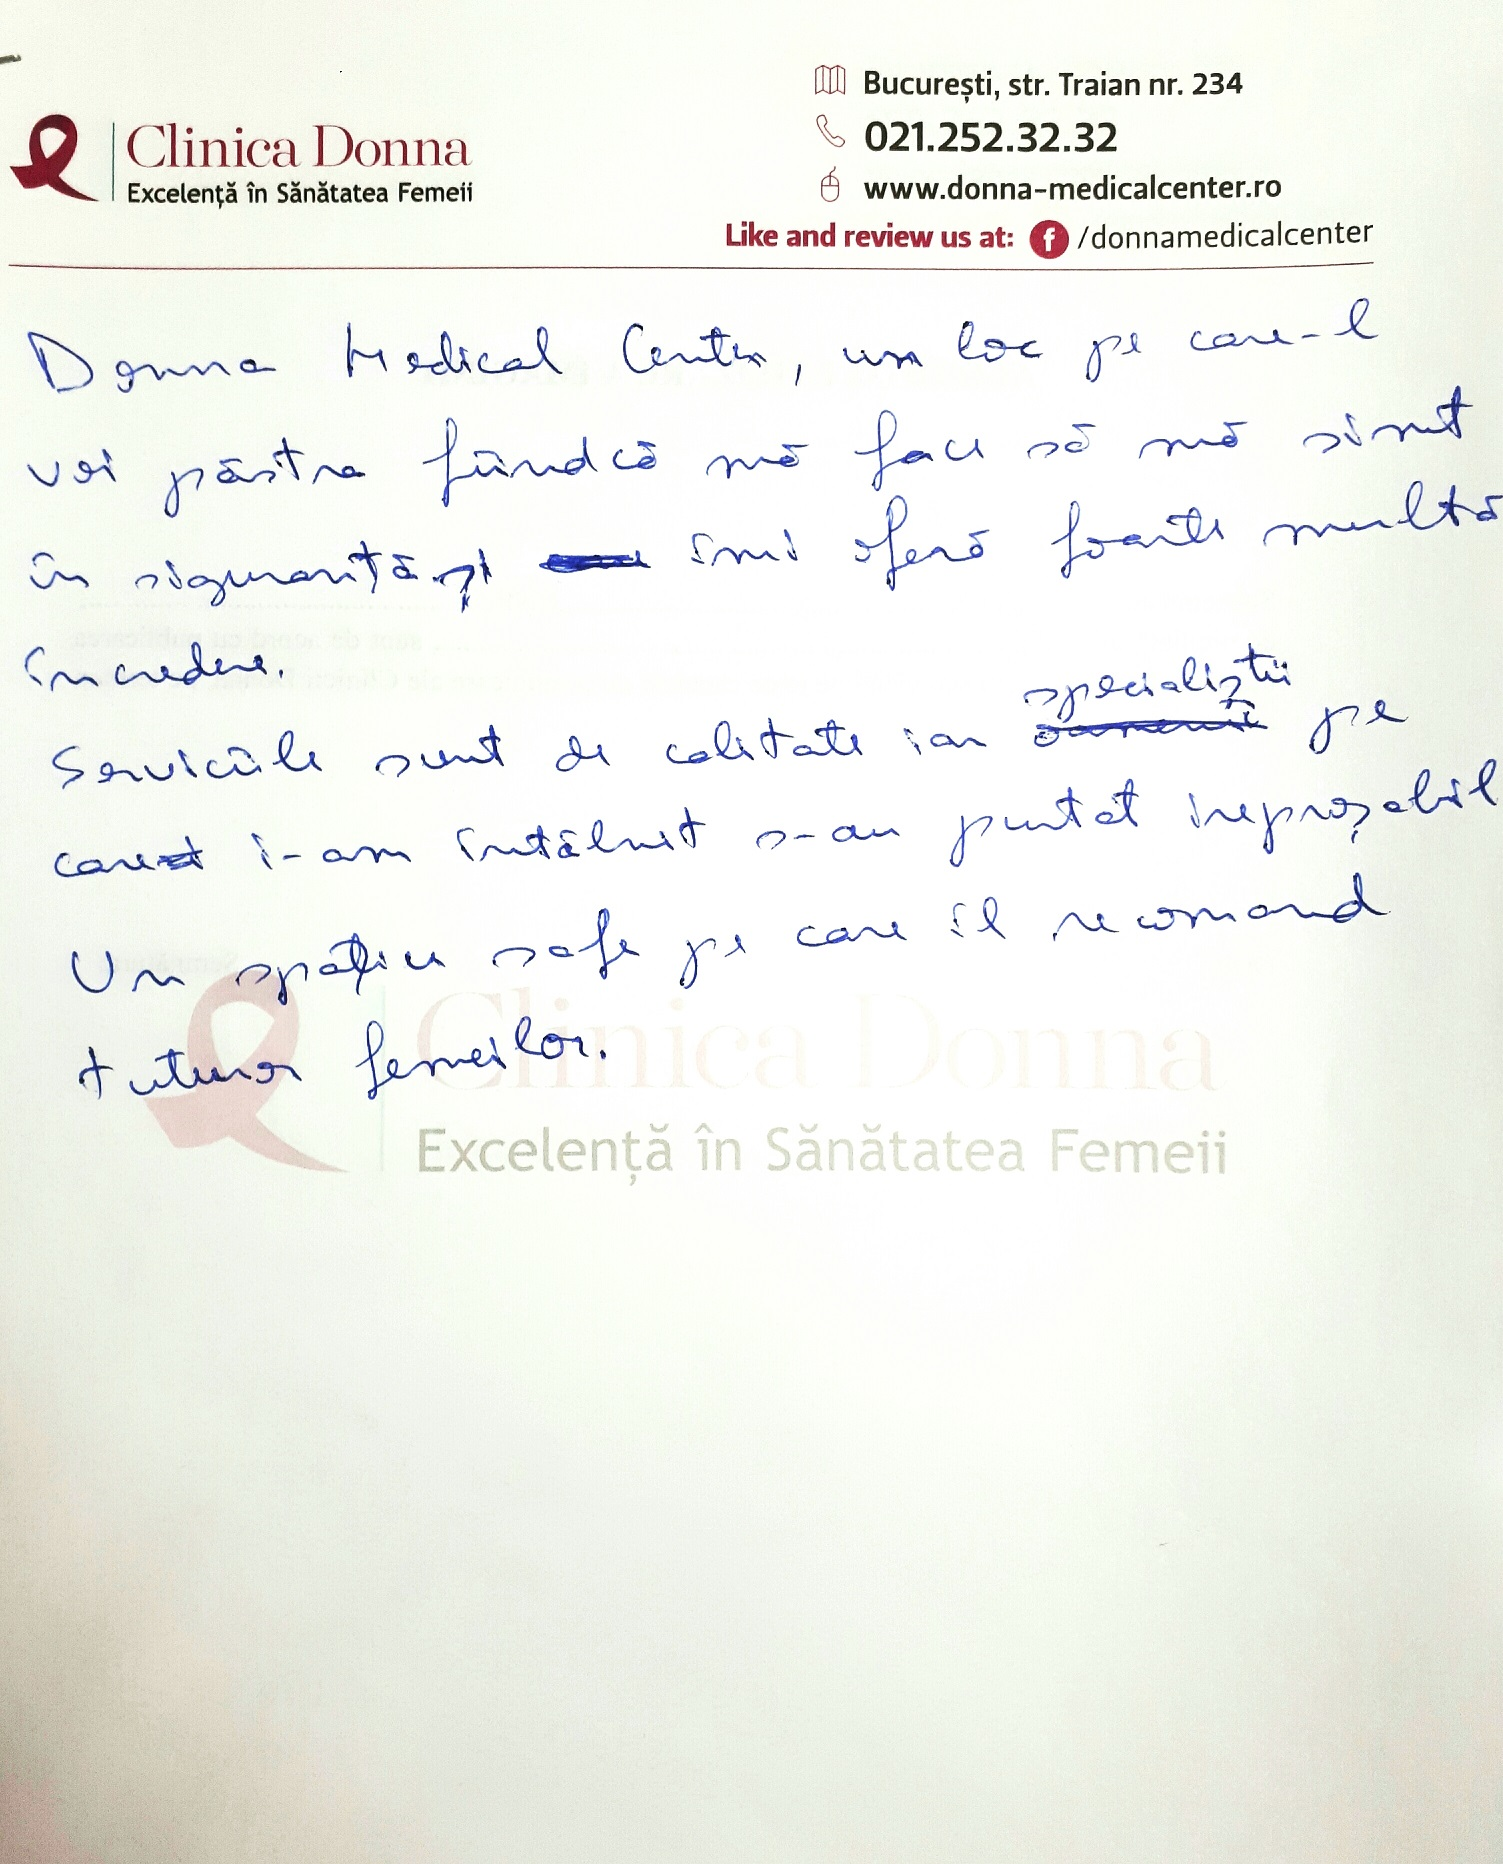 Mitruț Loredana, 08.01.2018